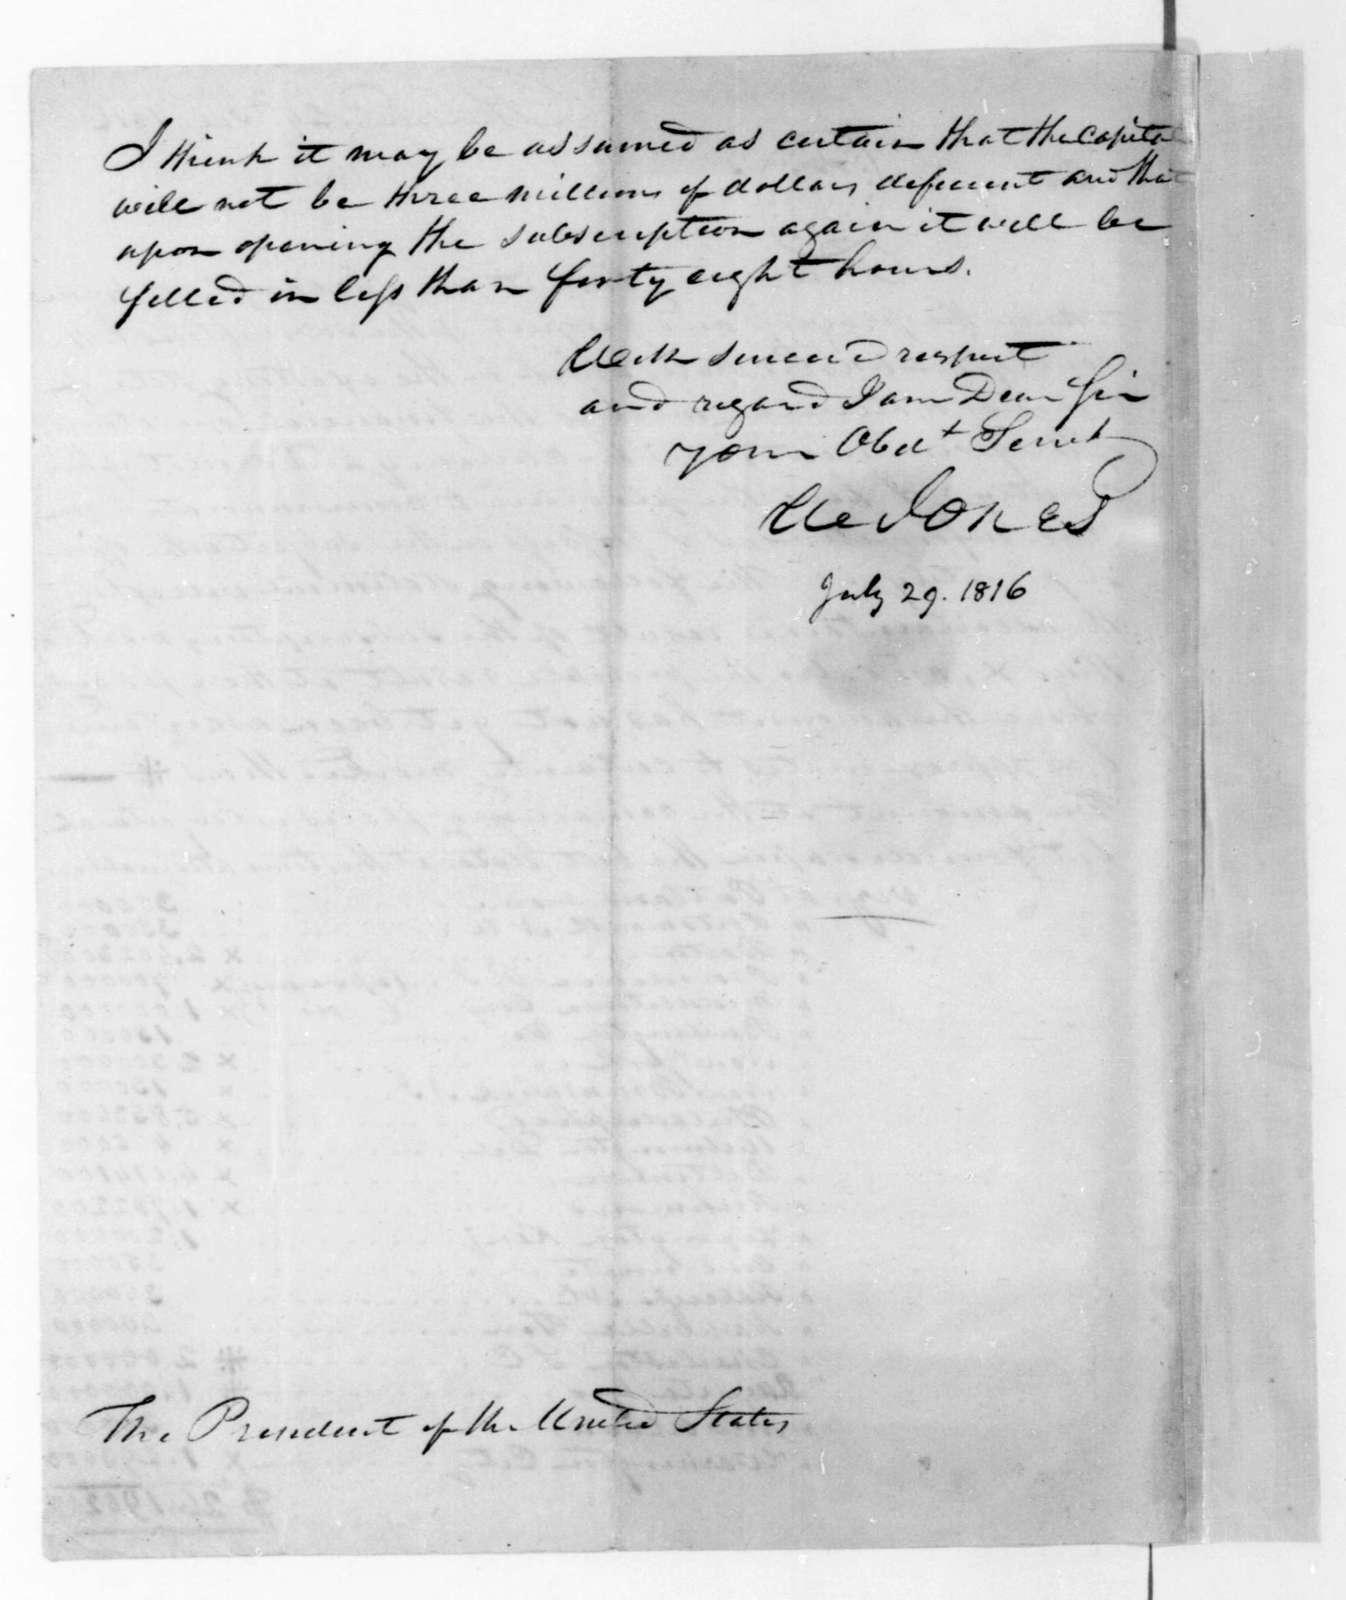 William Jones to James Madison, July 29, 1816.